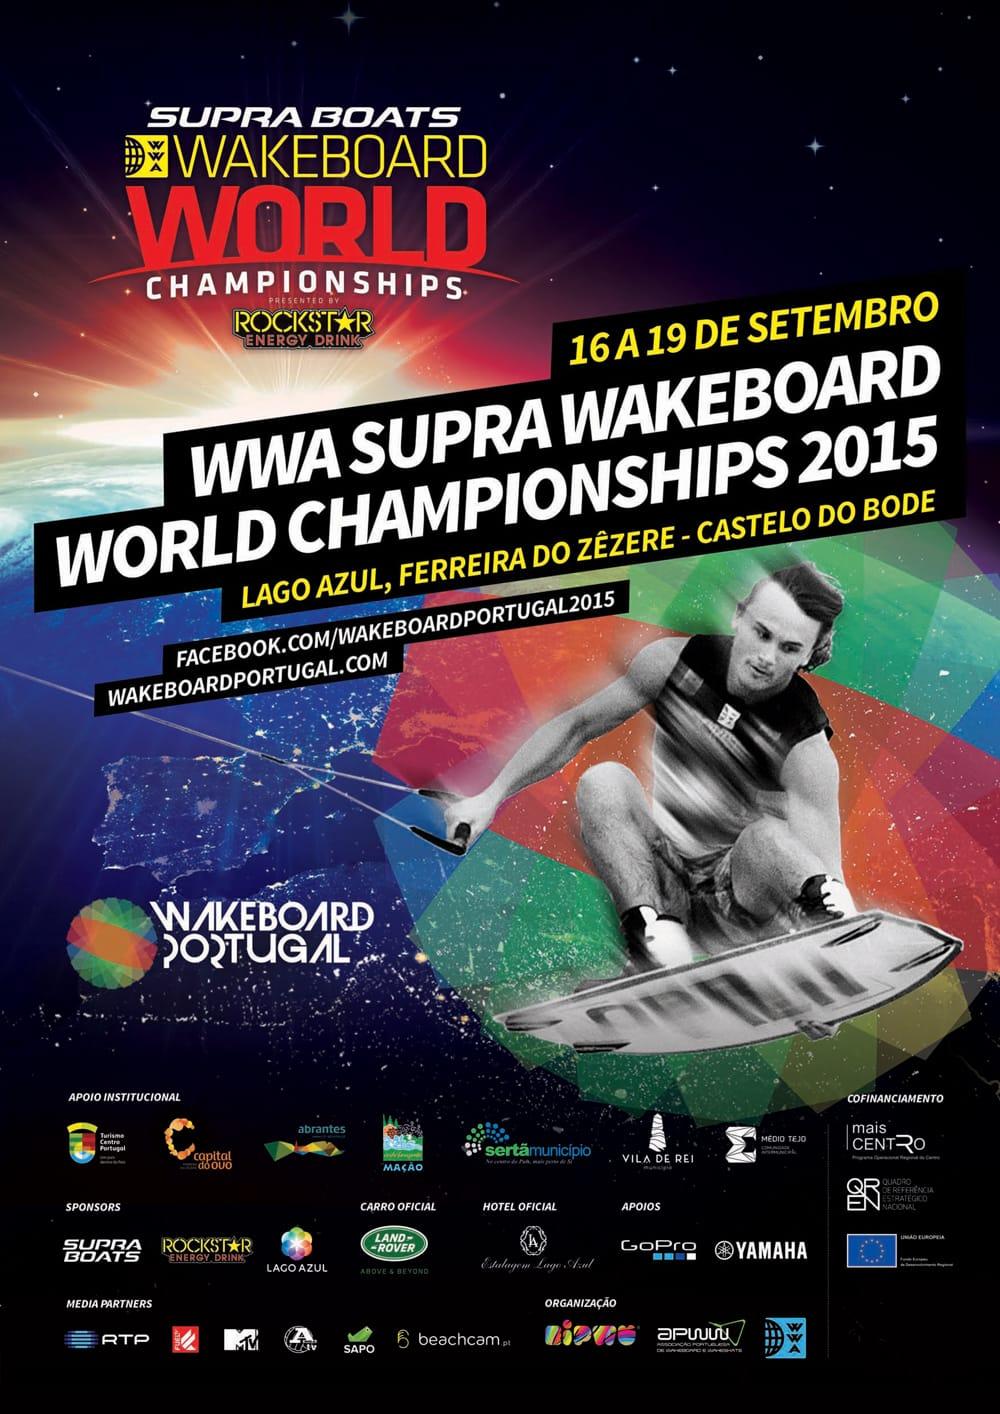 Wakeboard World Championships 2015